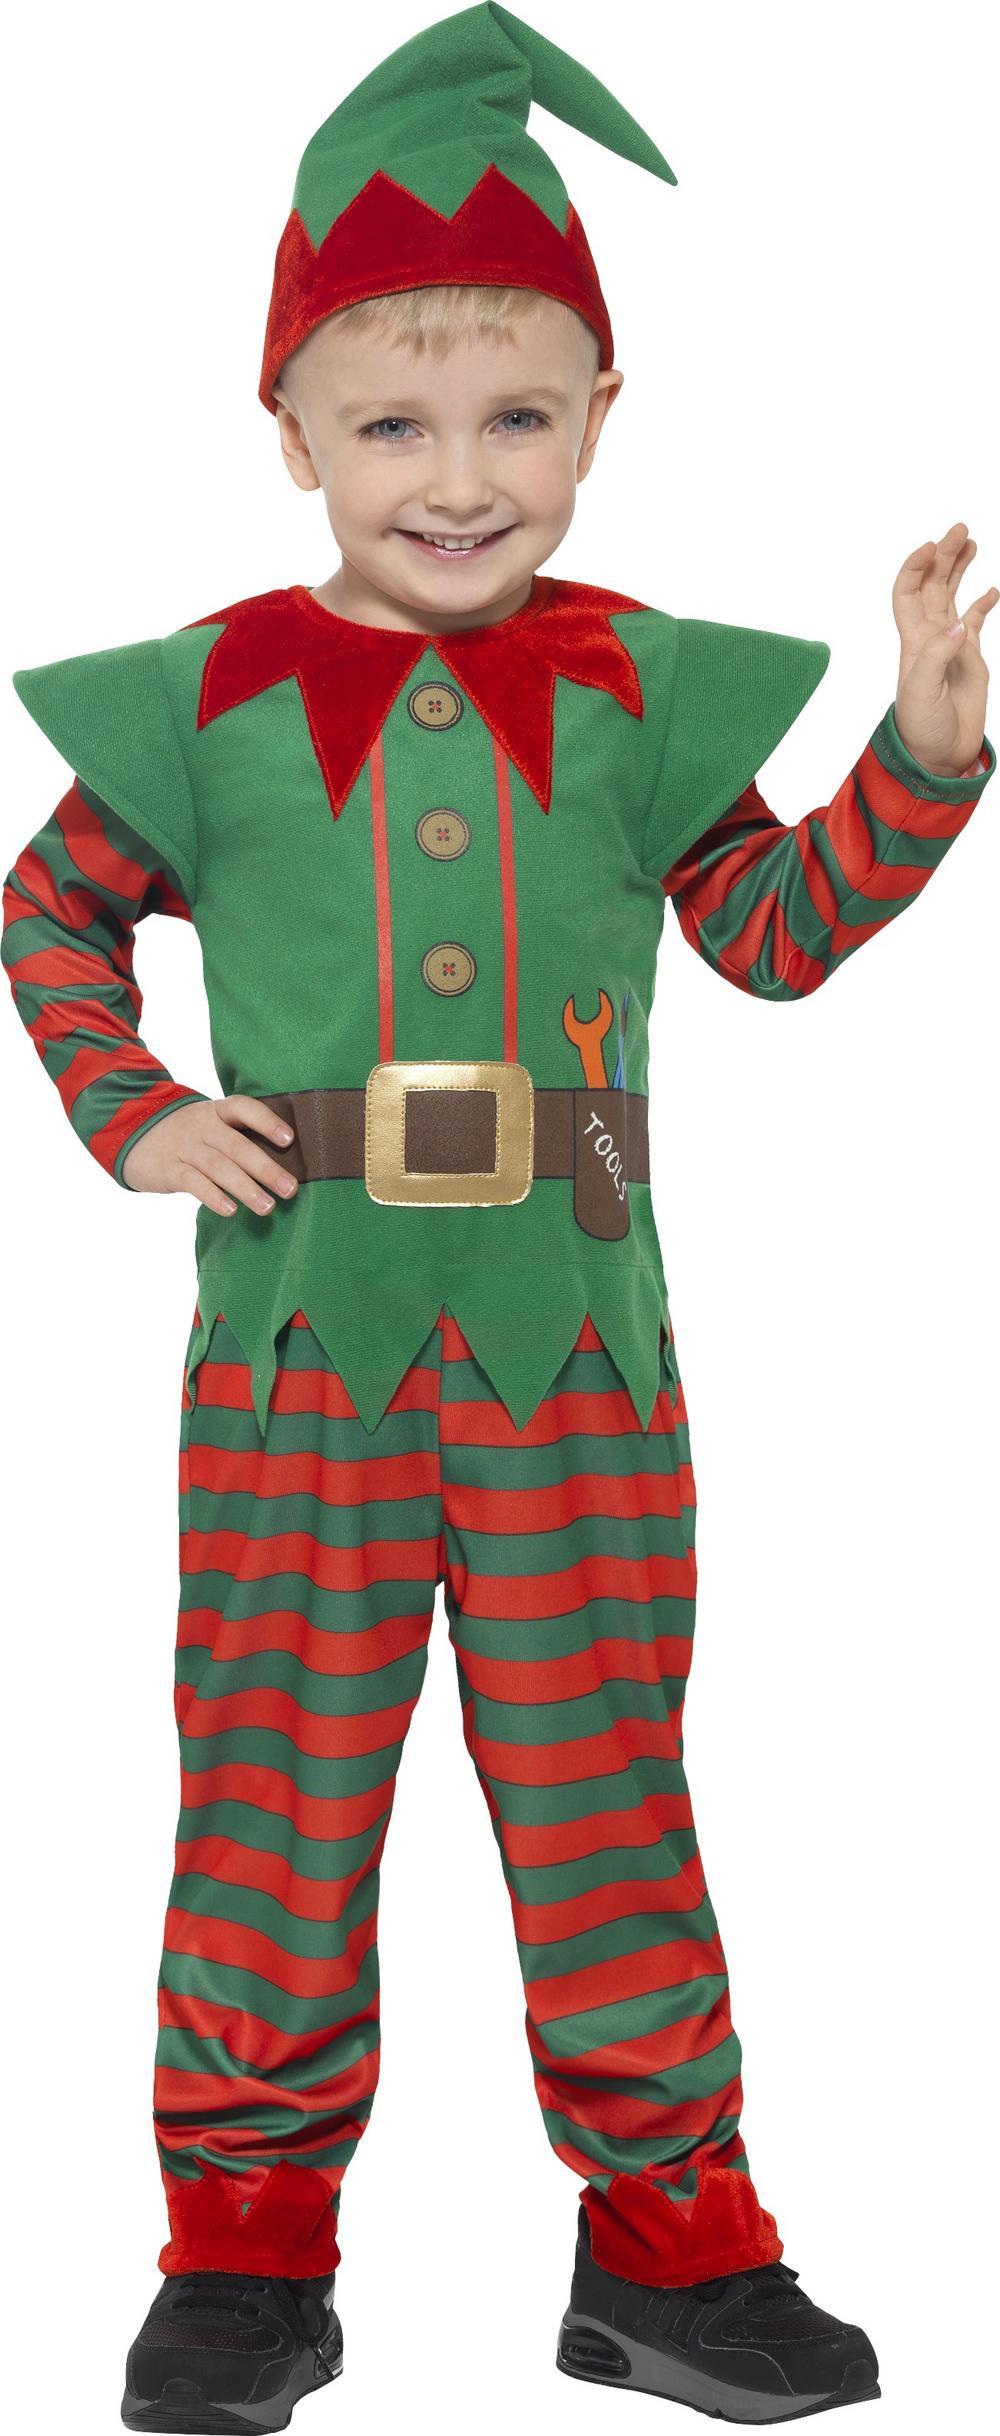 Elf Toddler Kids Costume